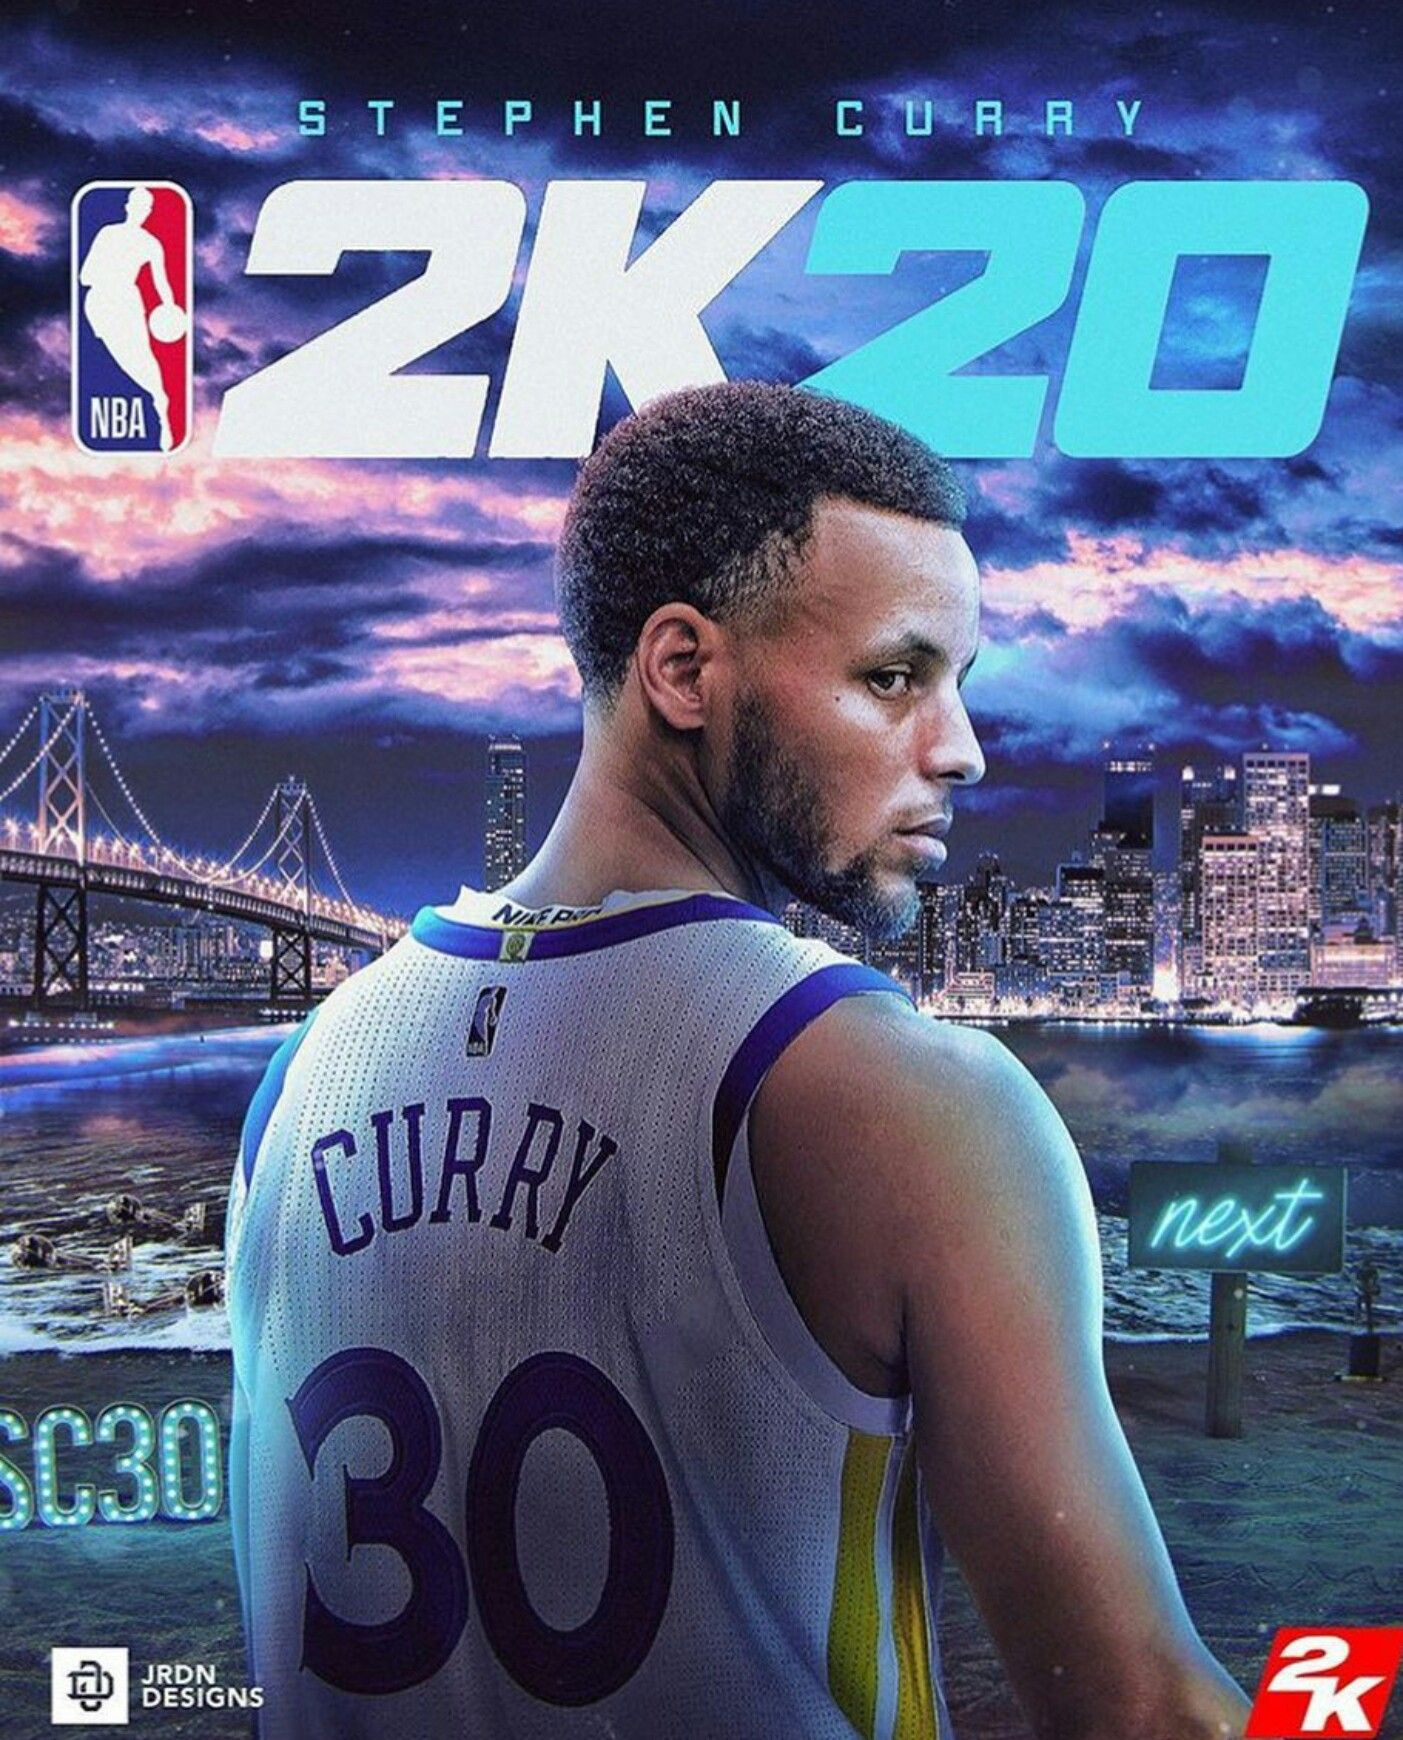 Pin By Enticing On Nba It S Fan U Kno Nba Basketball Players Stephen Curry Basketball Players Nba Nba